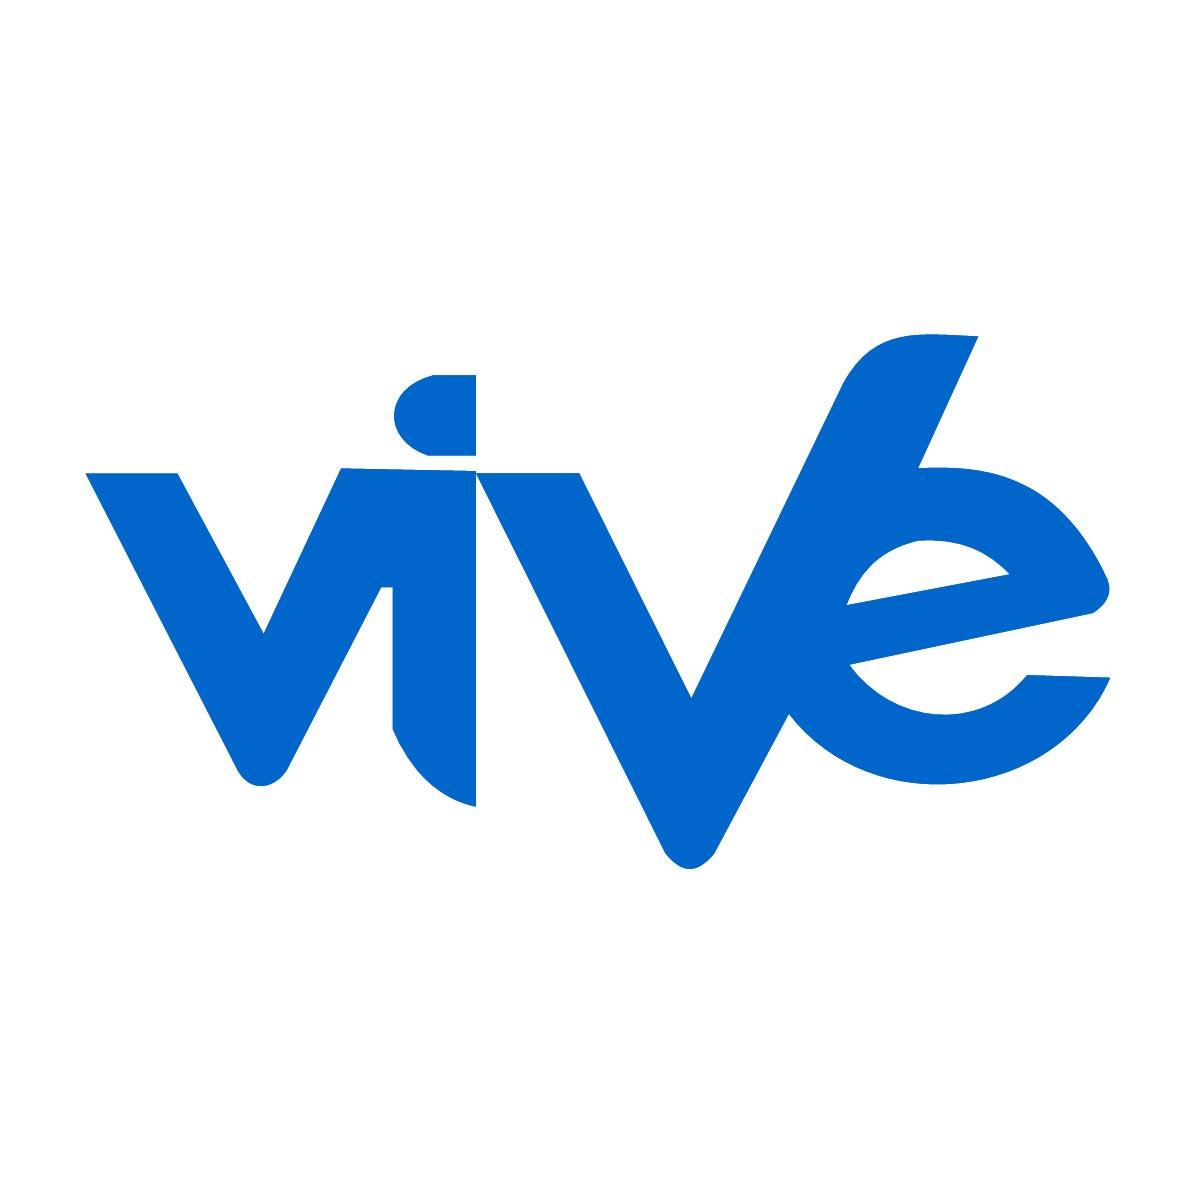 ViVe TV